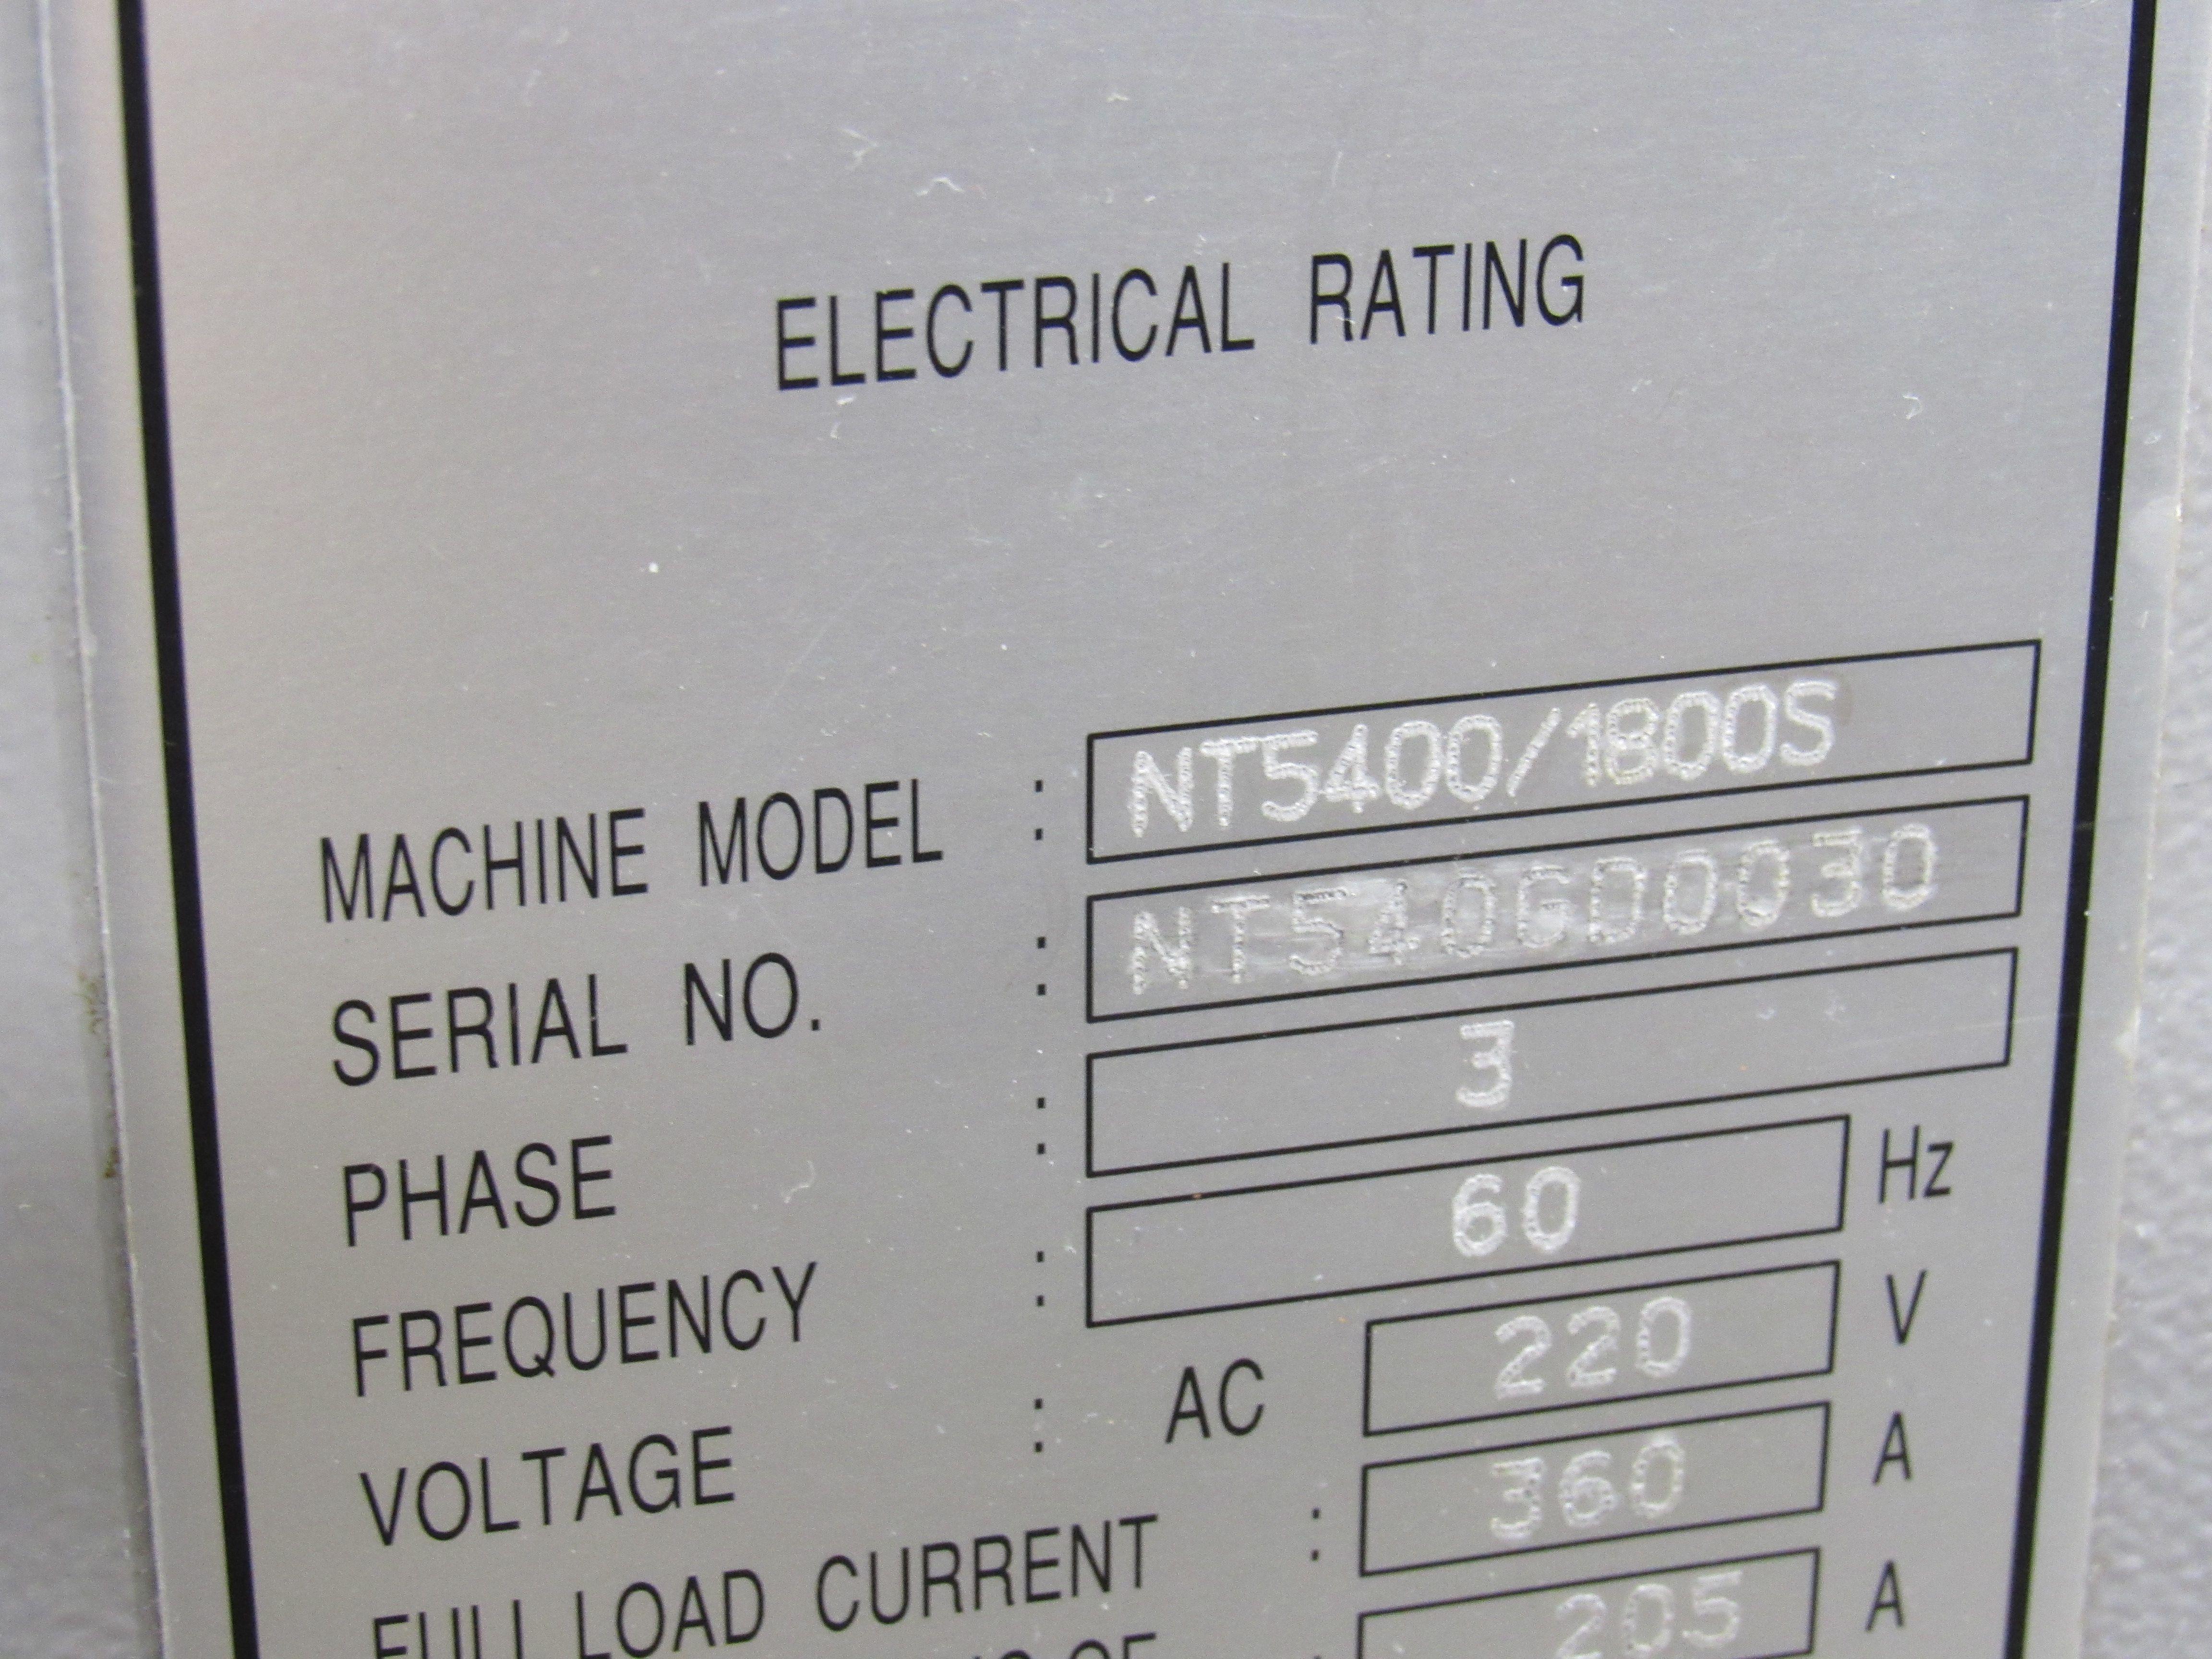 ARATRON EDM 450